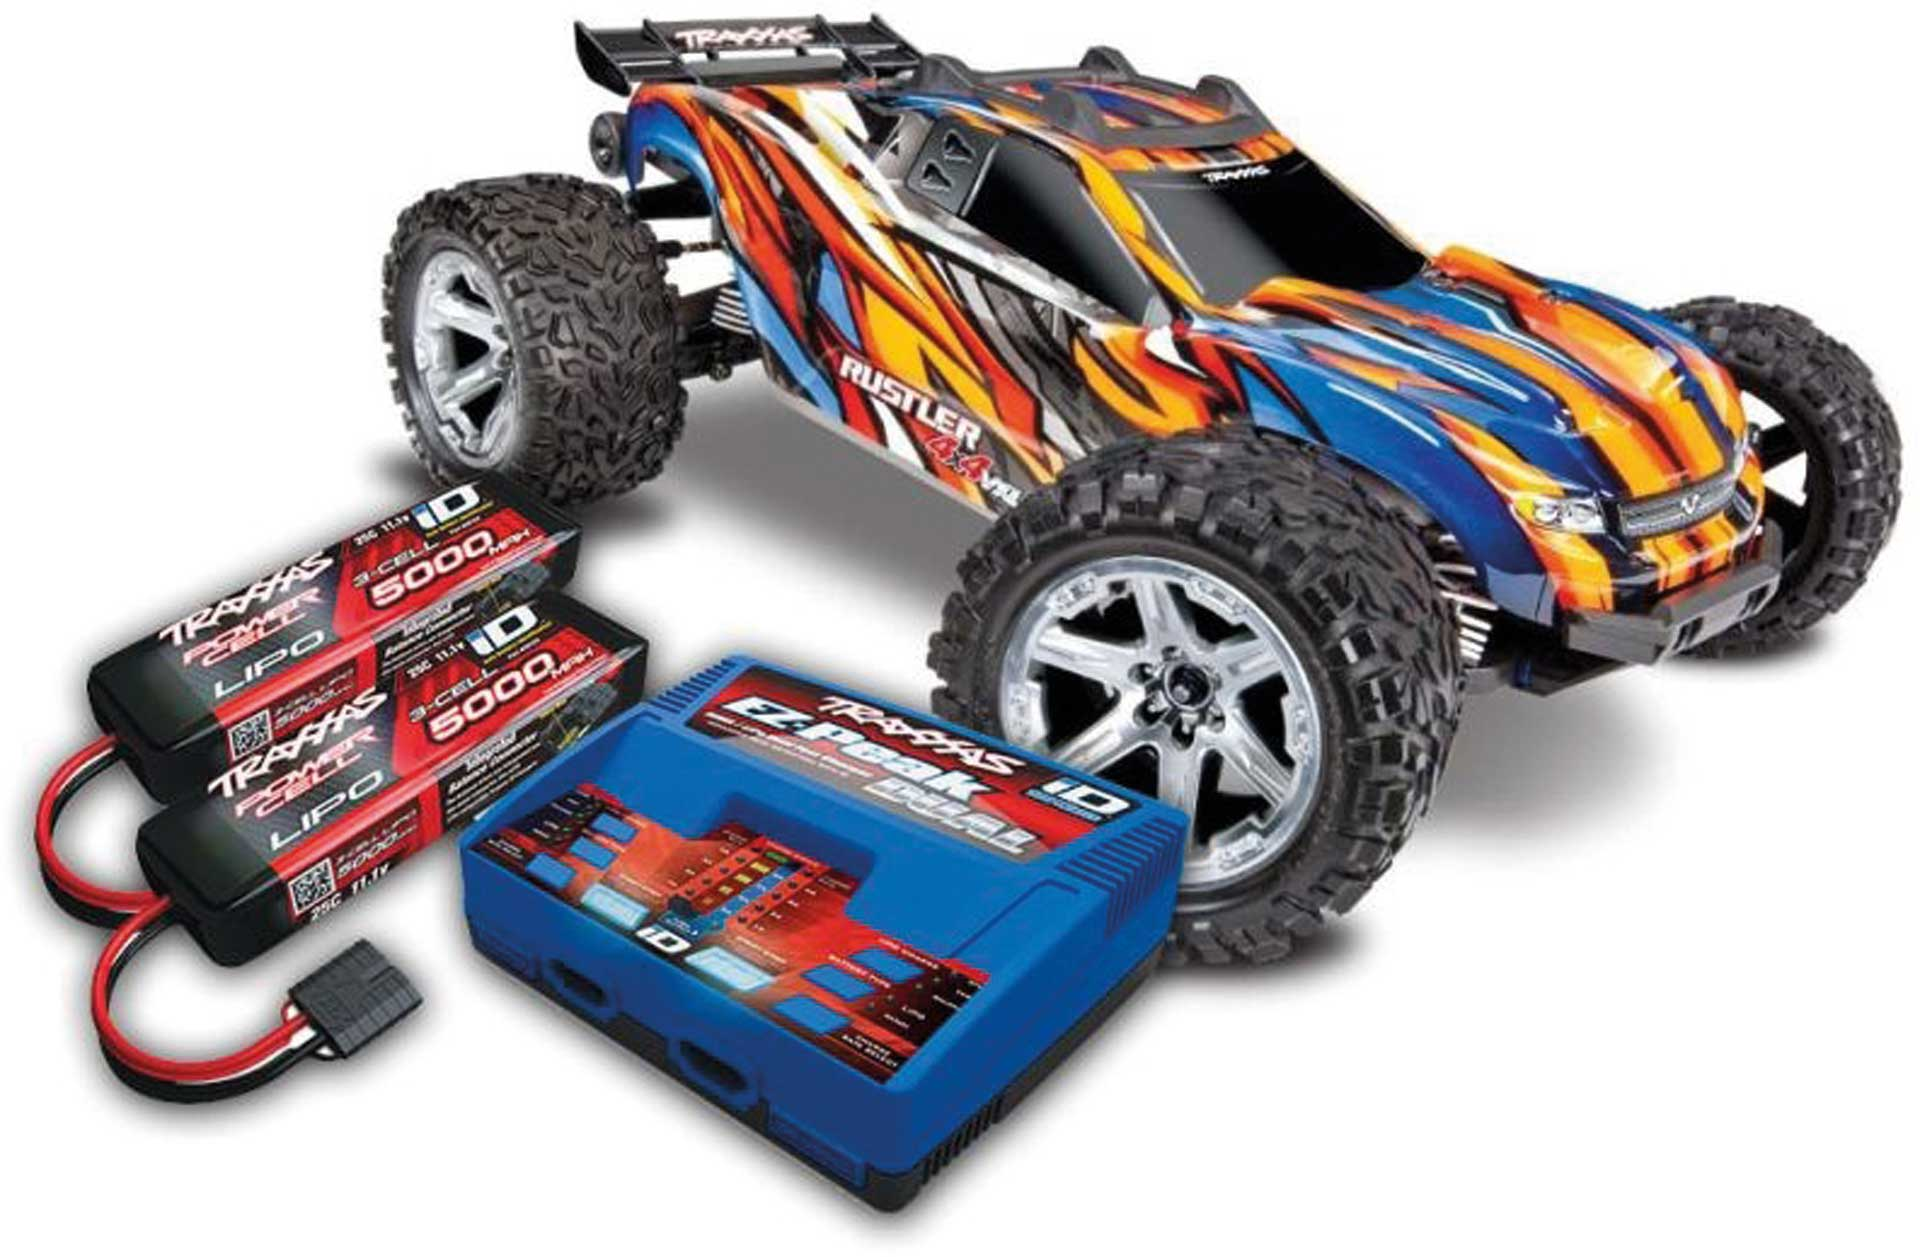 TRAXXAS RUSTLER 4X4 VXL BRUSHLESS ORANGE RTR MIT AKKU/LADER-SET *AKTION* 1/10 4WD STADIUM TRUCK (TRX67076-4 + TRX2990GX)